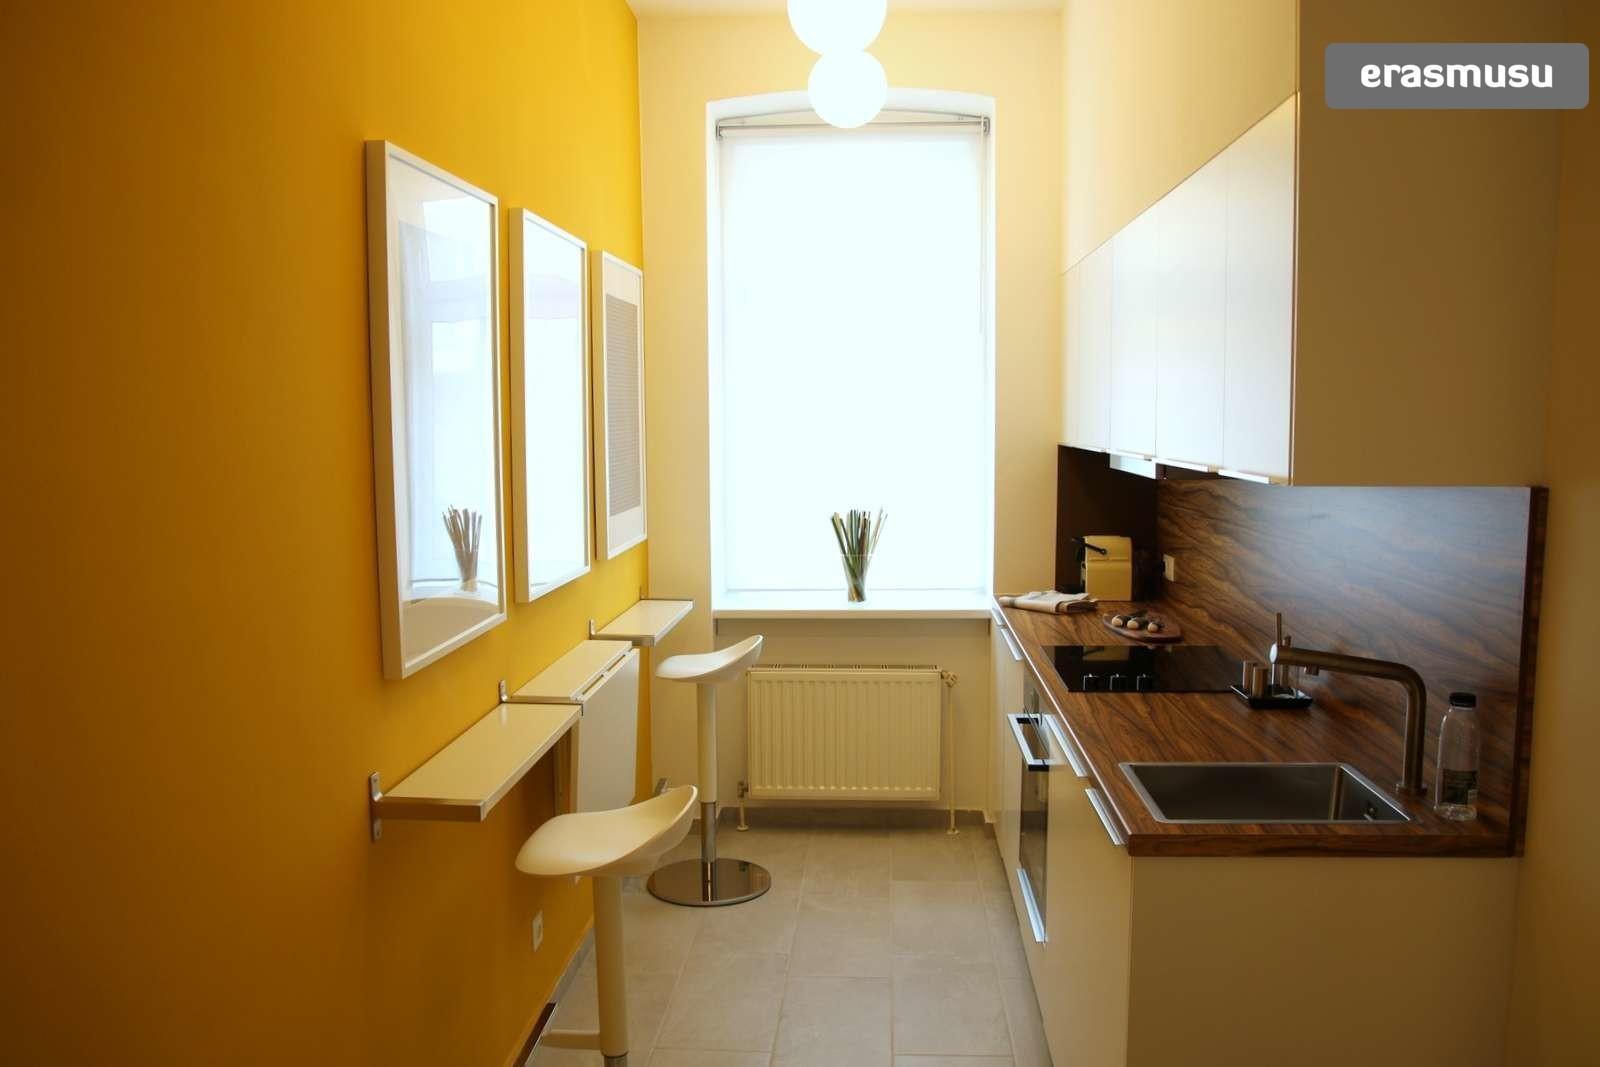 charming-studio-apartment-rent-wahring-e8c874c3c2fbd274e7eb326ec